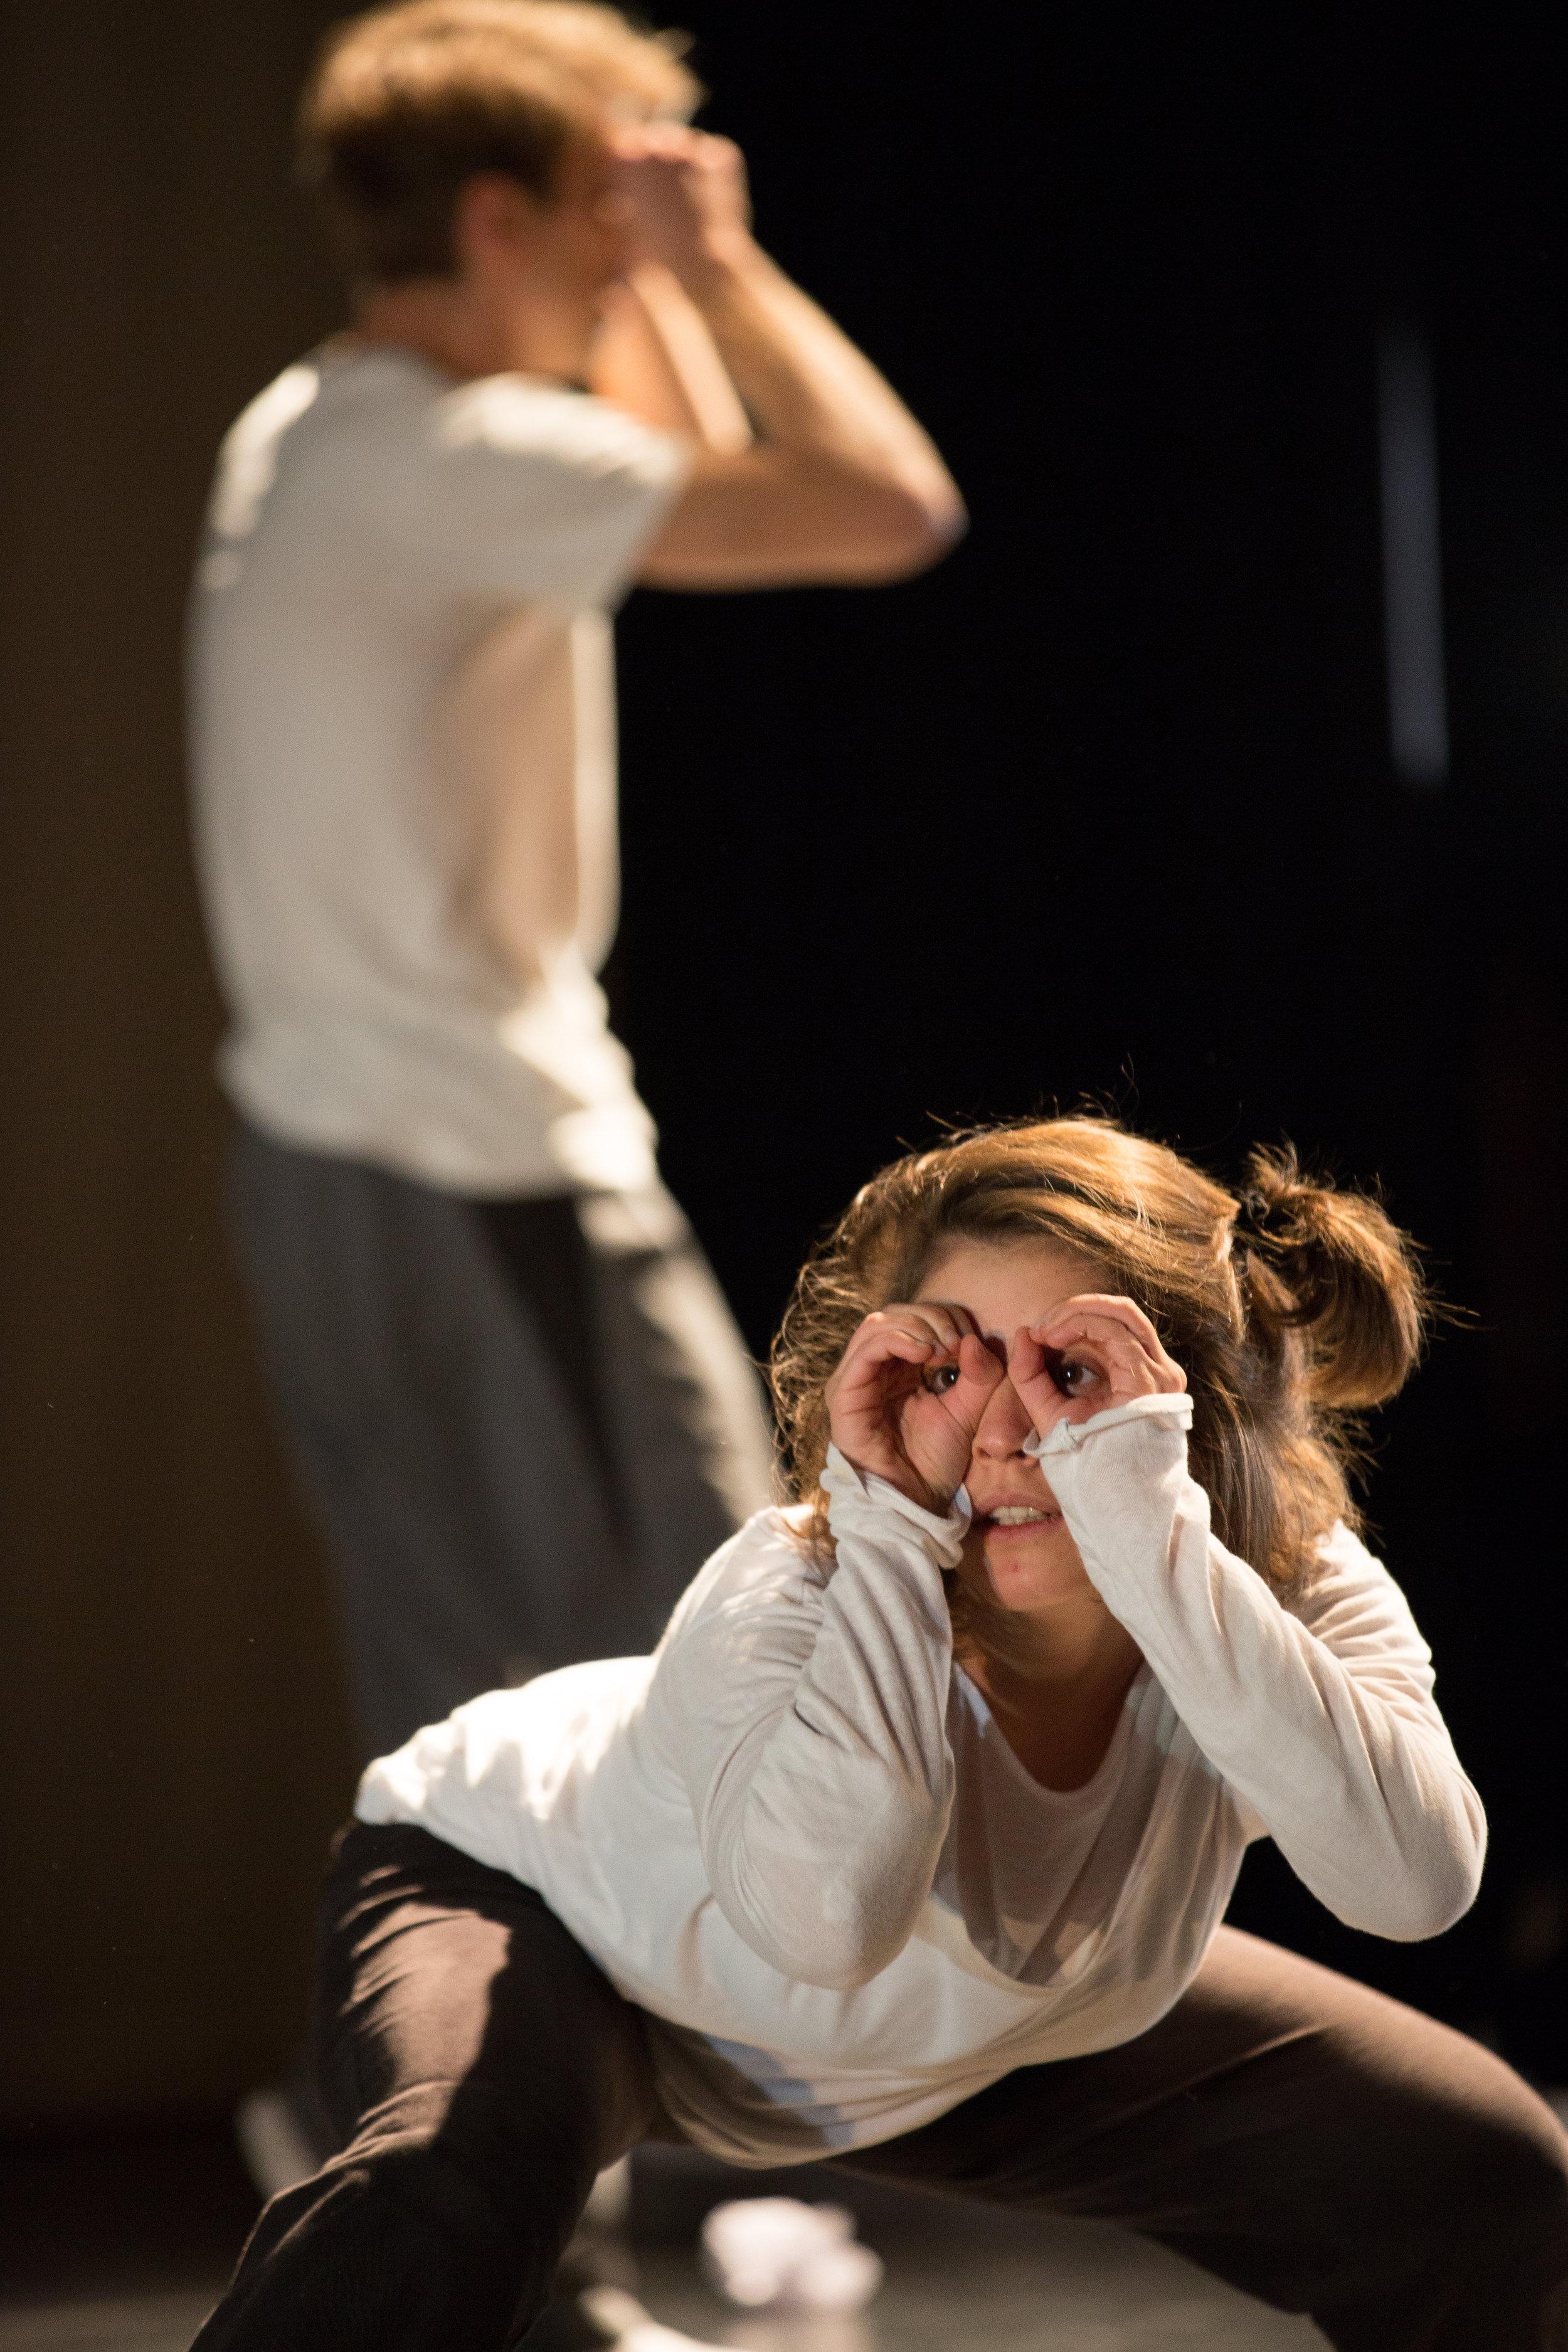 Image: Sid Scott. Dancers: Romain Guion & Marta Masiero.